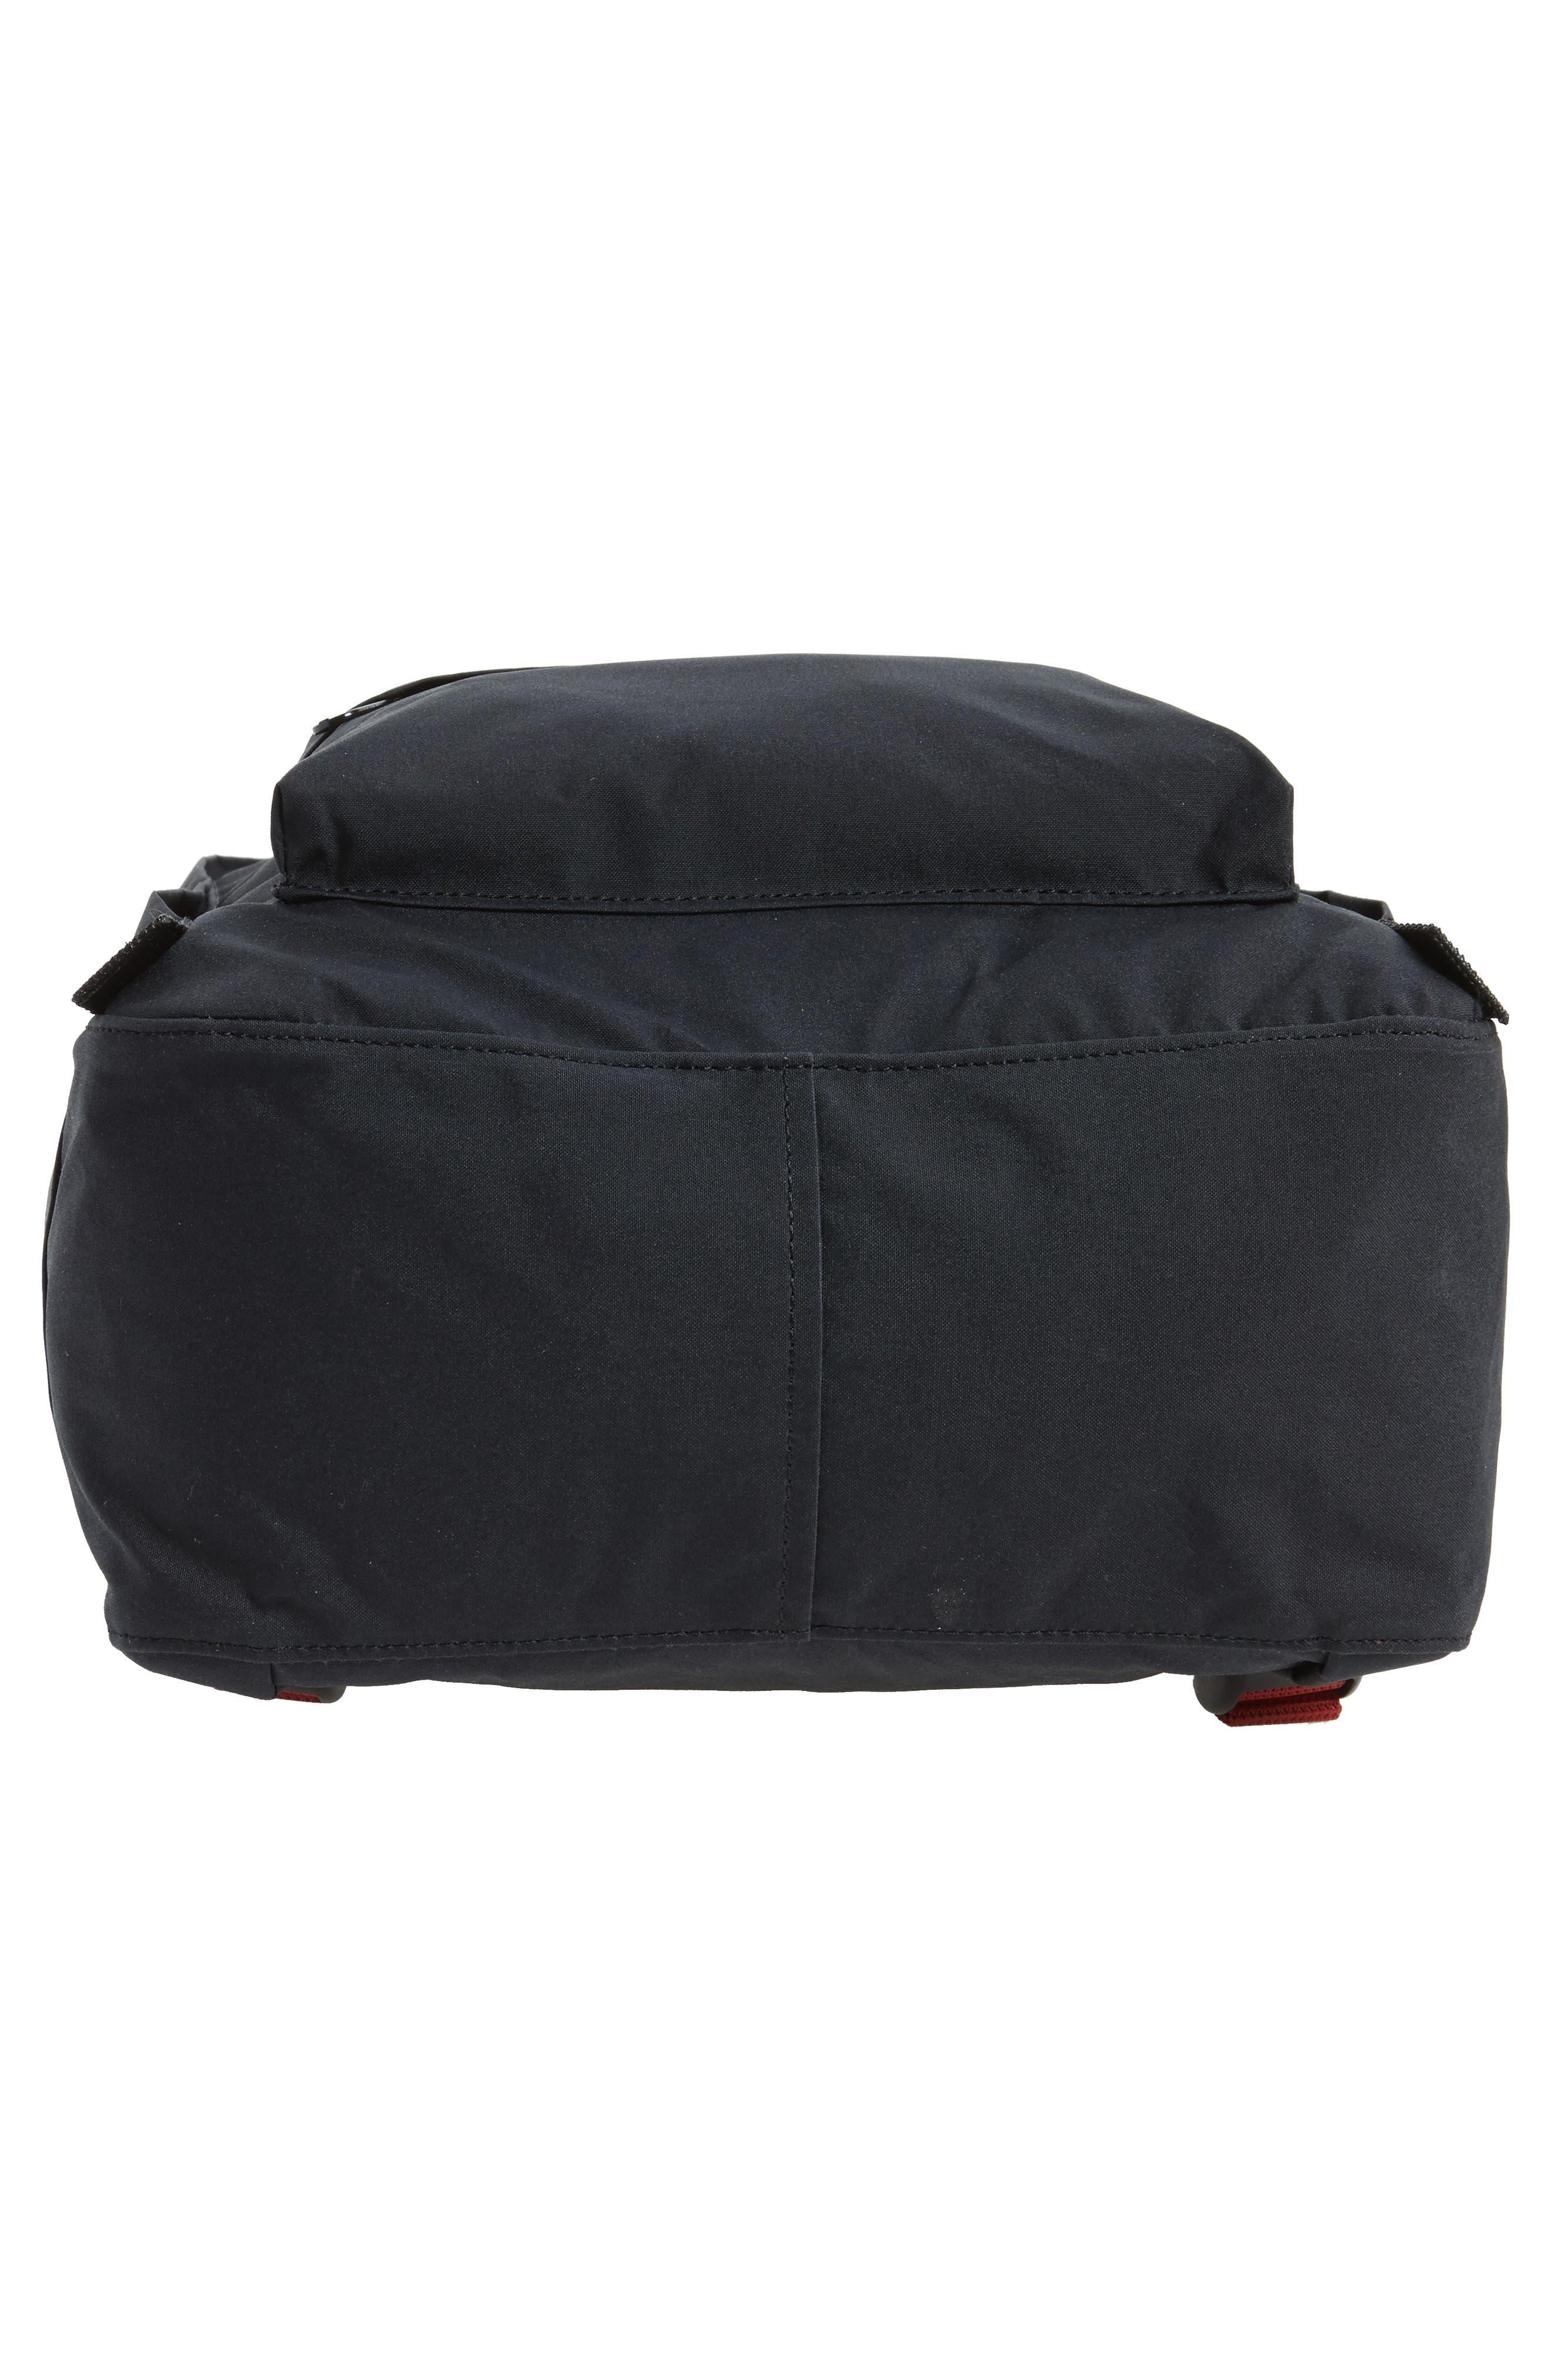 'Kånken' Water Resistant Backpack,                             Alternate thumbnail 322, color,